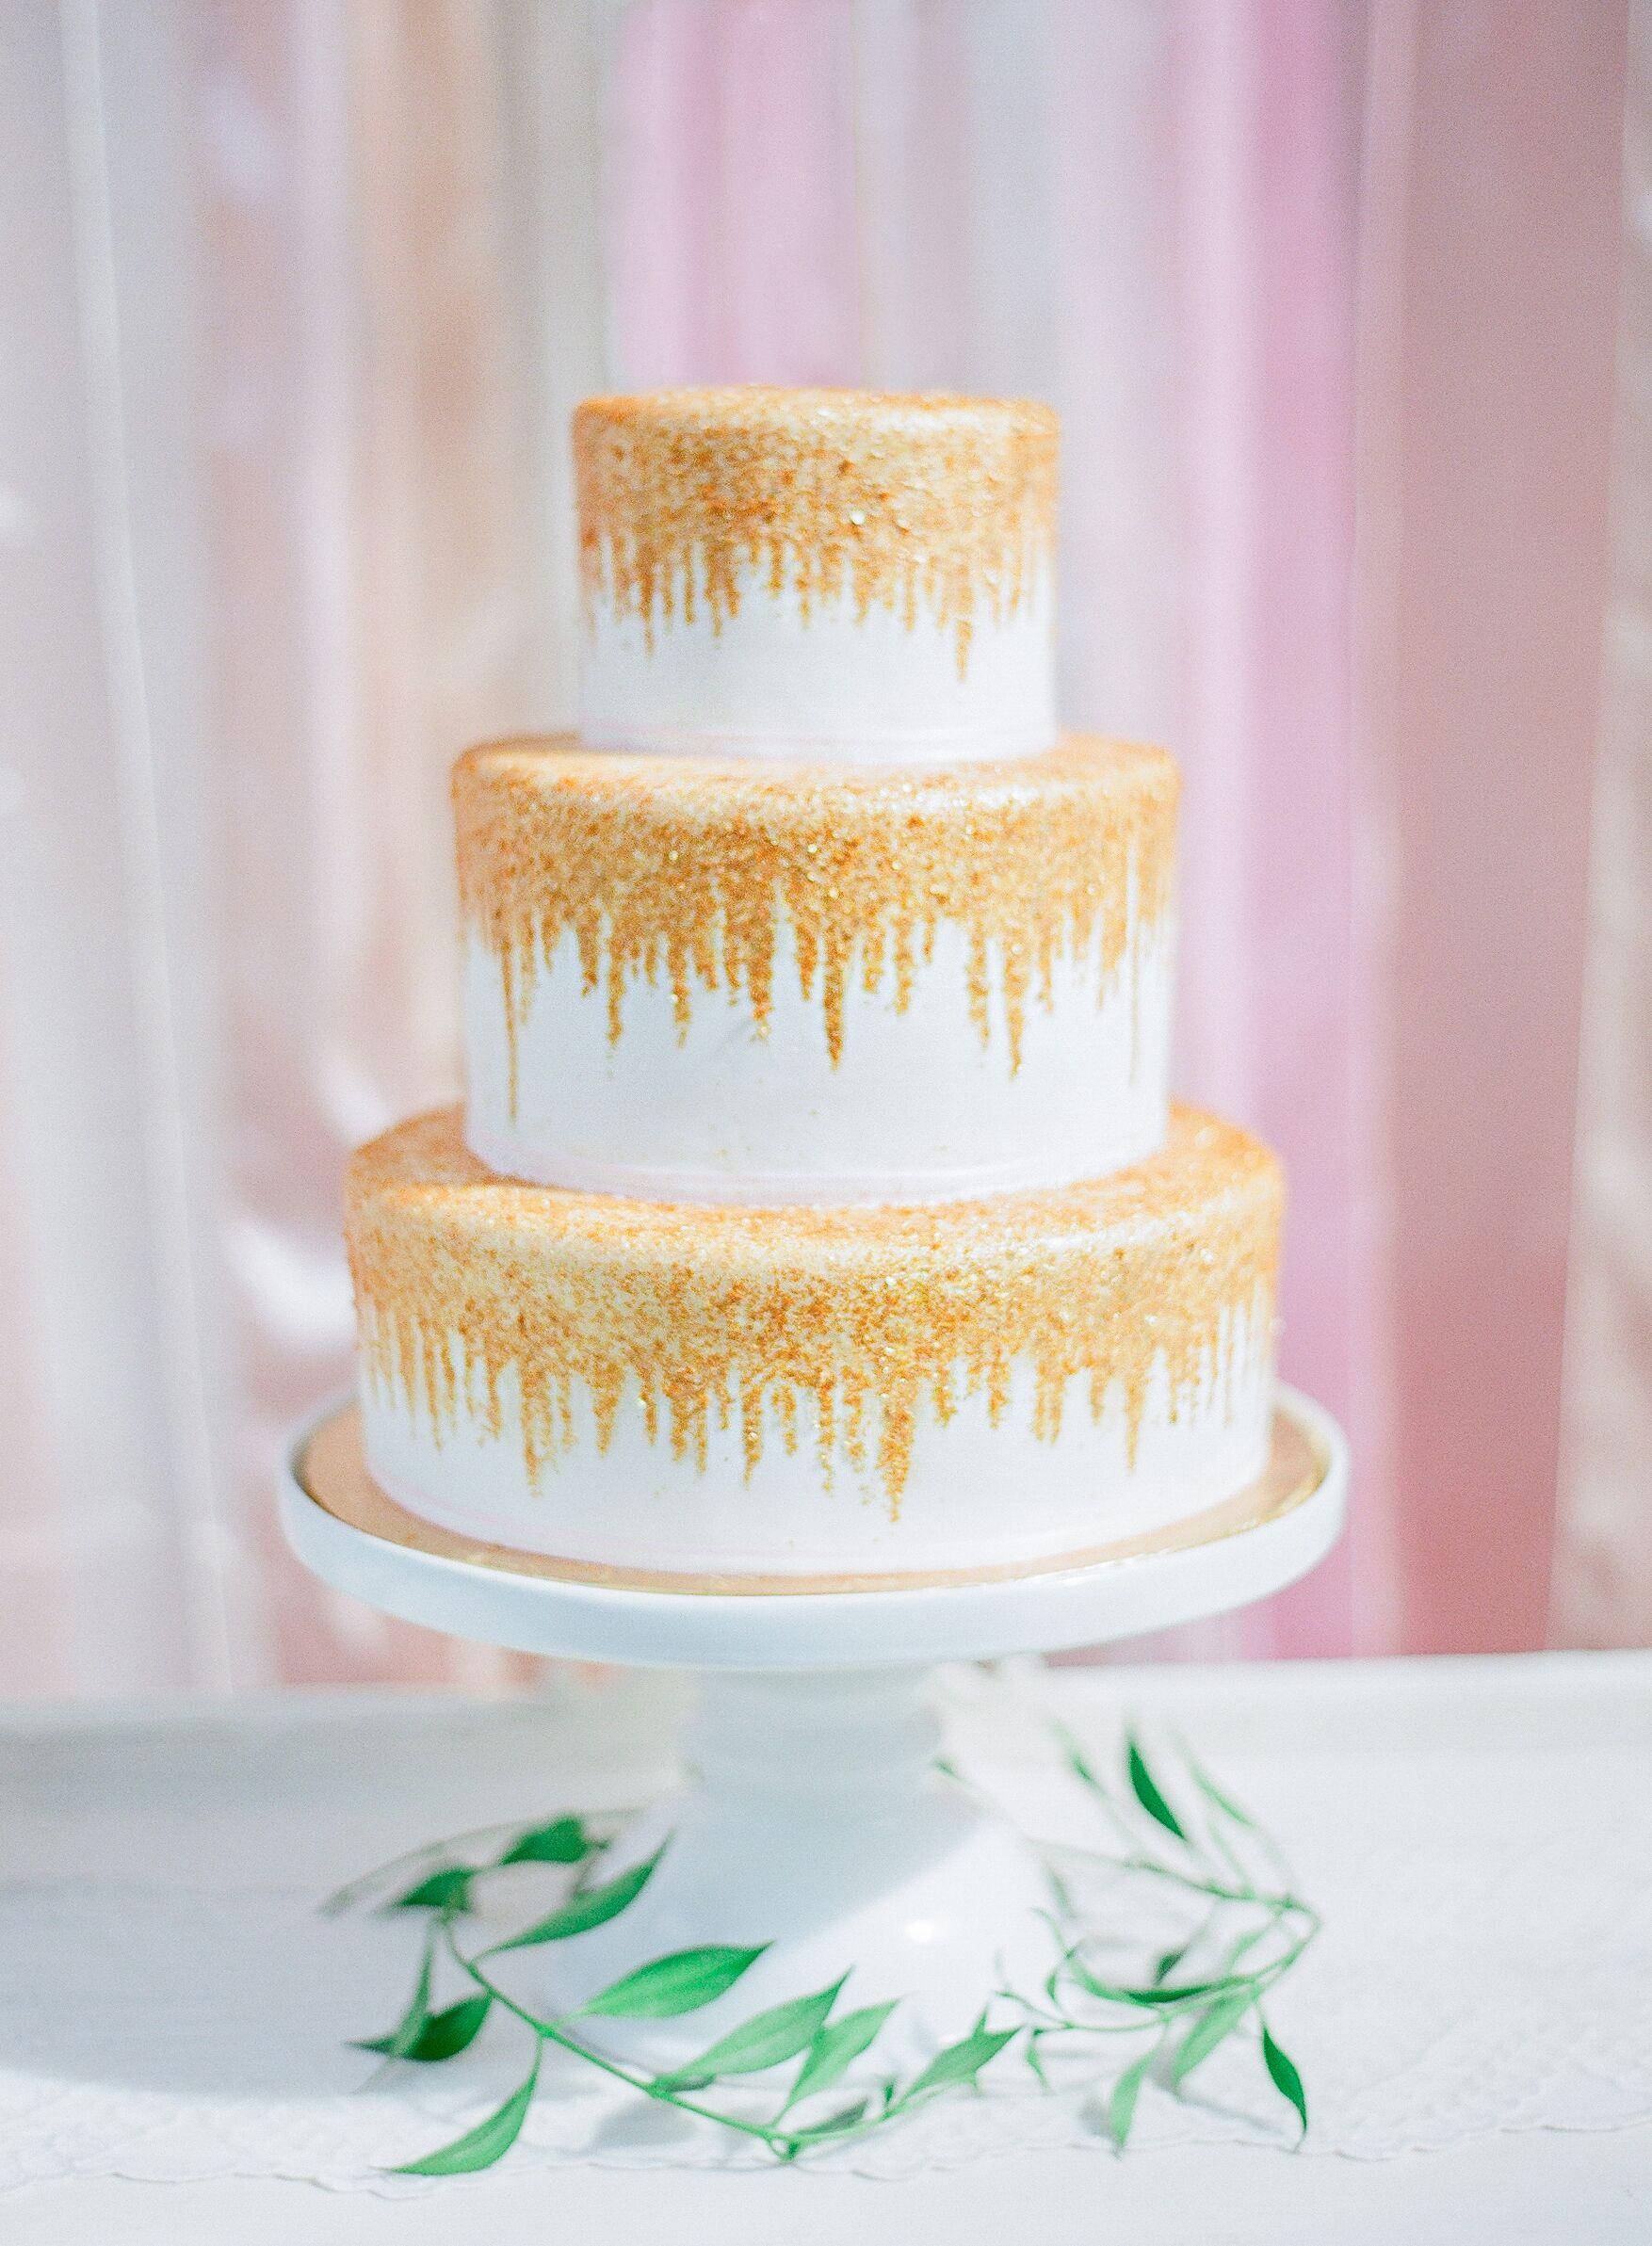 wedding cake. hand-painted gold glitter cake wedding